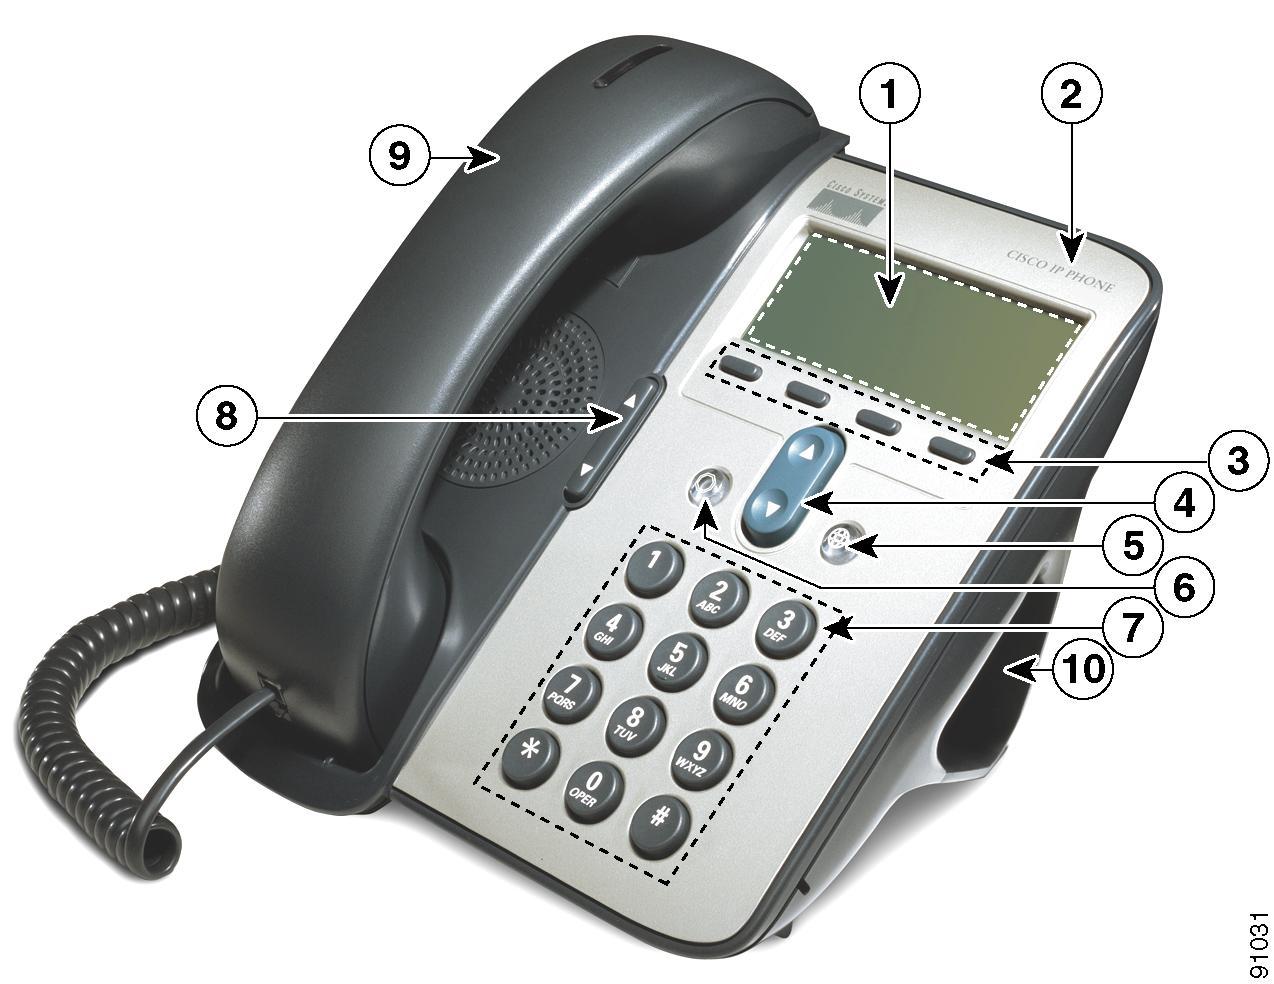 Cisco IP Phone 7905G/7912G シリーズ ユーザ ガイド